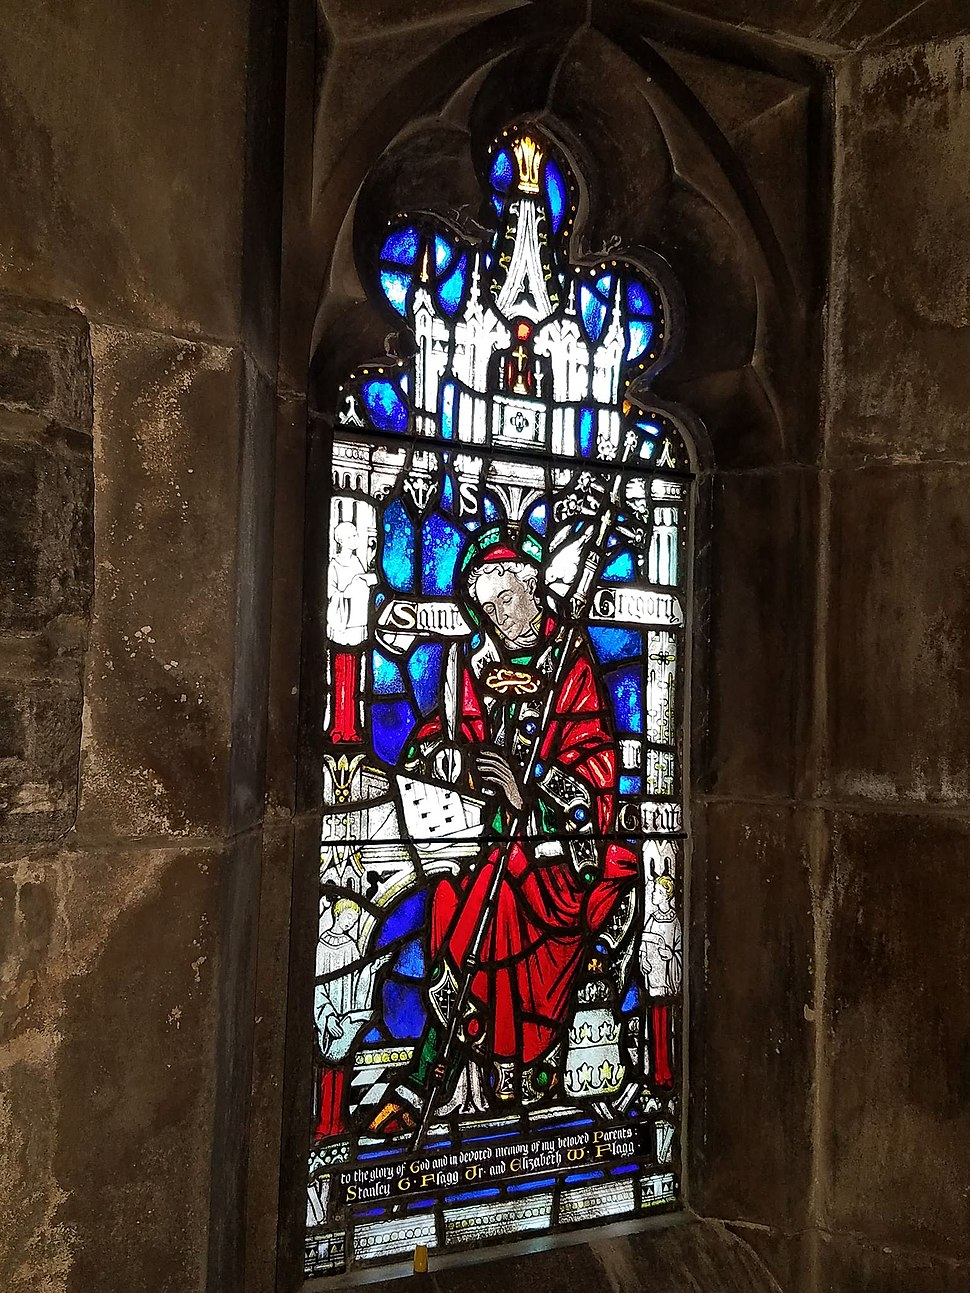 Window, St. Gregory the Great, Church of the Good Shepherd (Rosemont, Pennsylvania)